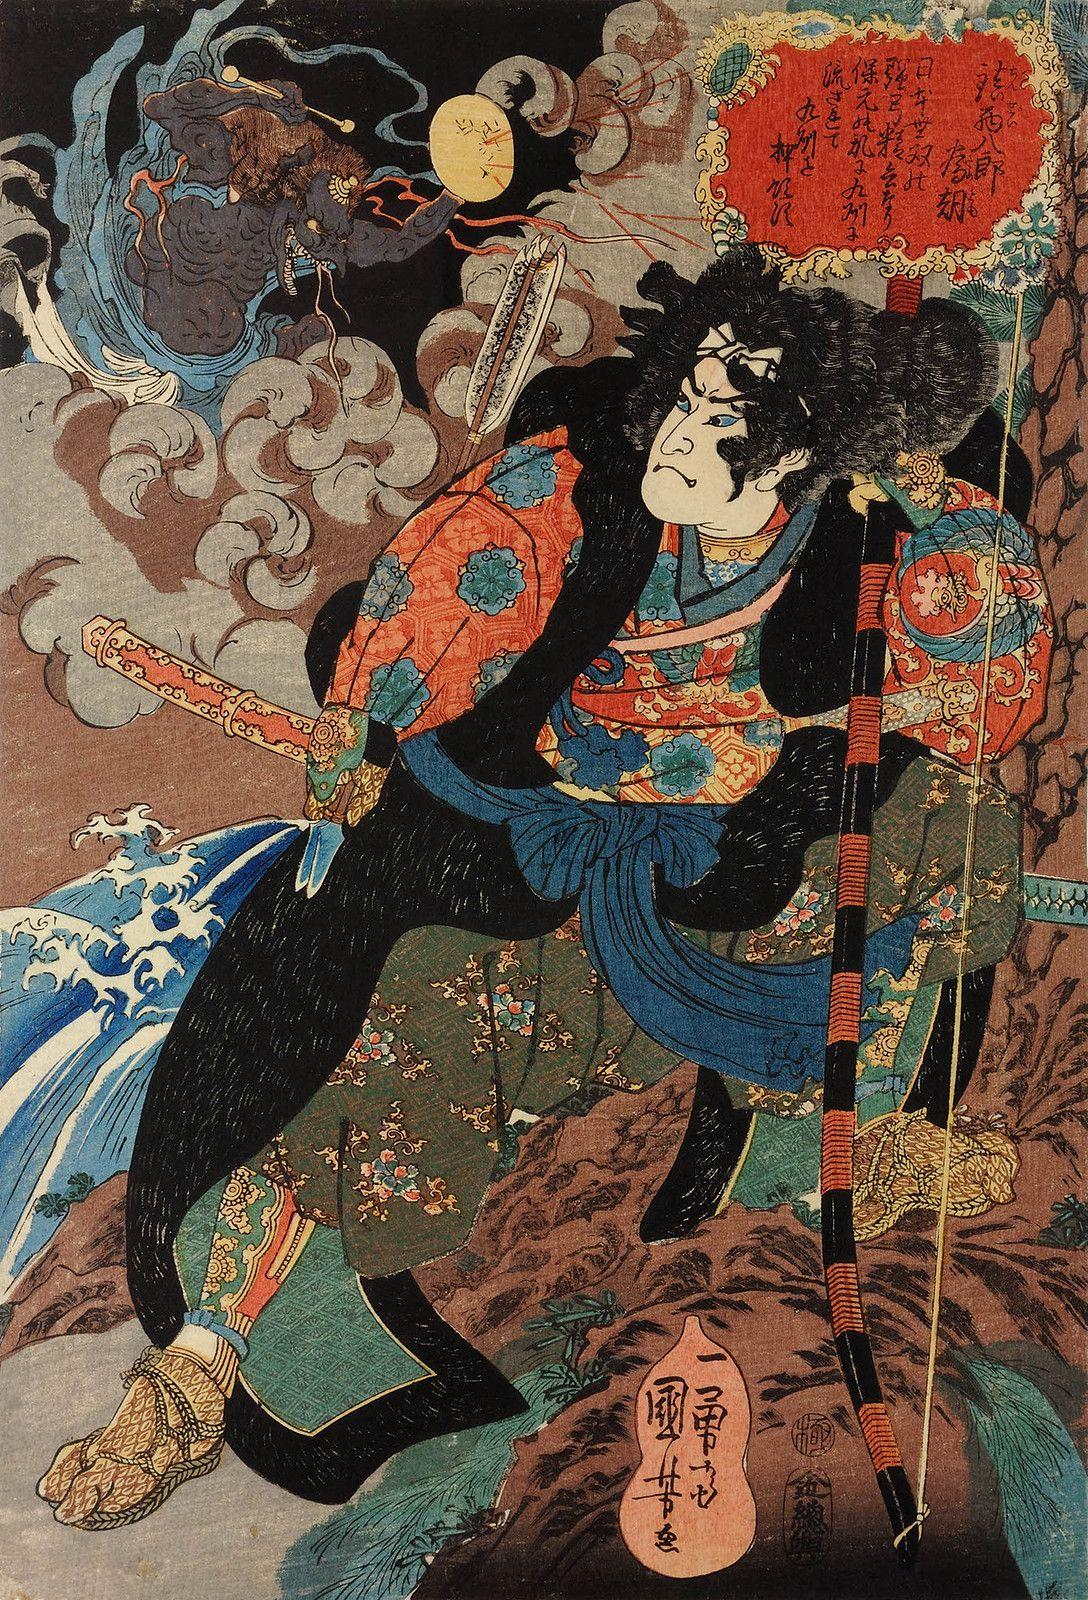 ART PRINT POSTER PAINTING WOODBLOCK JAPANESE WAR KYUSENPO SACUCHO NOFL0923